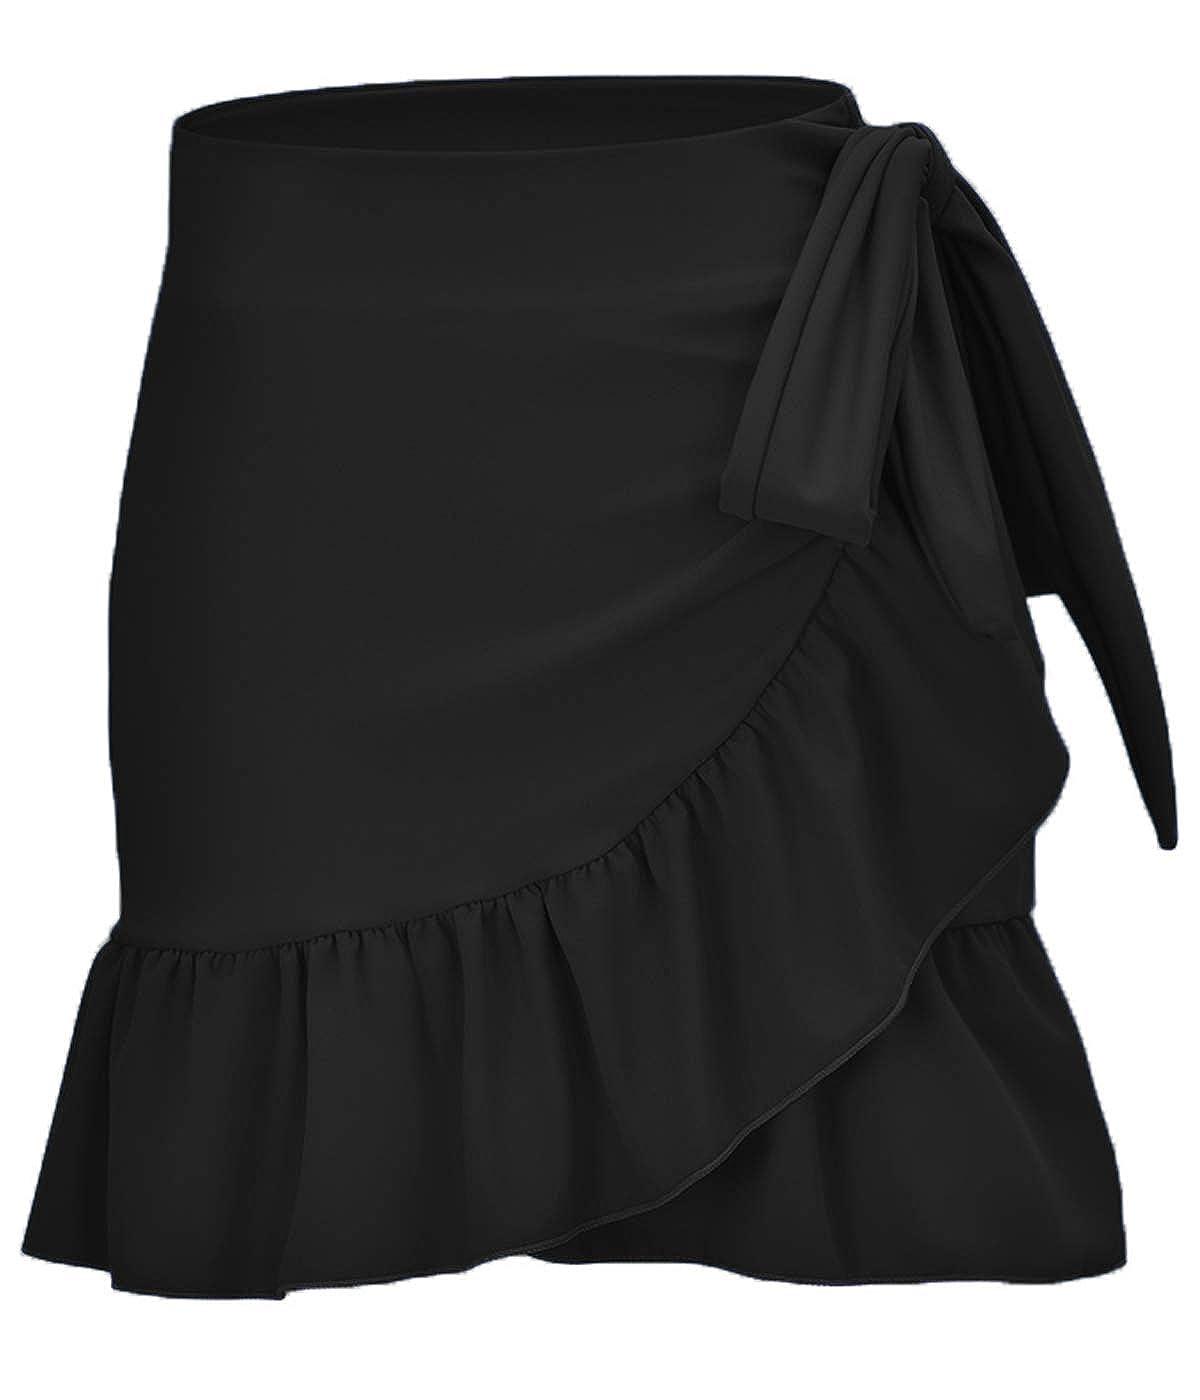 9f0fb510a4 ChinFun Women's Ruffle Sarongs Beach Wrap Swimwear Bikini Tankini Cover Up  Swim Skirts Swimdress at Amazon Women's Clothing store: